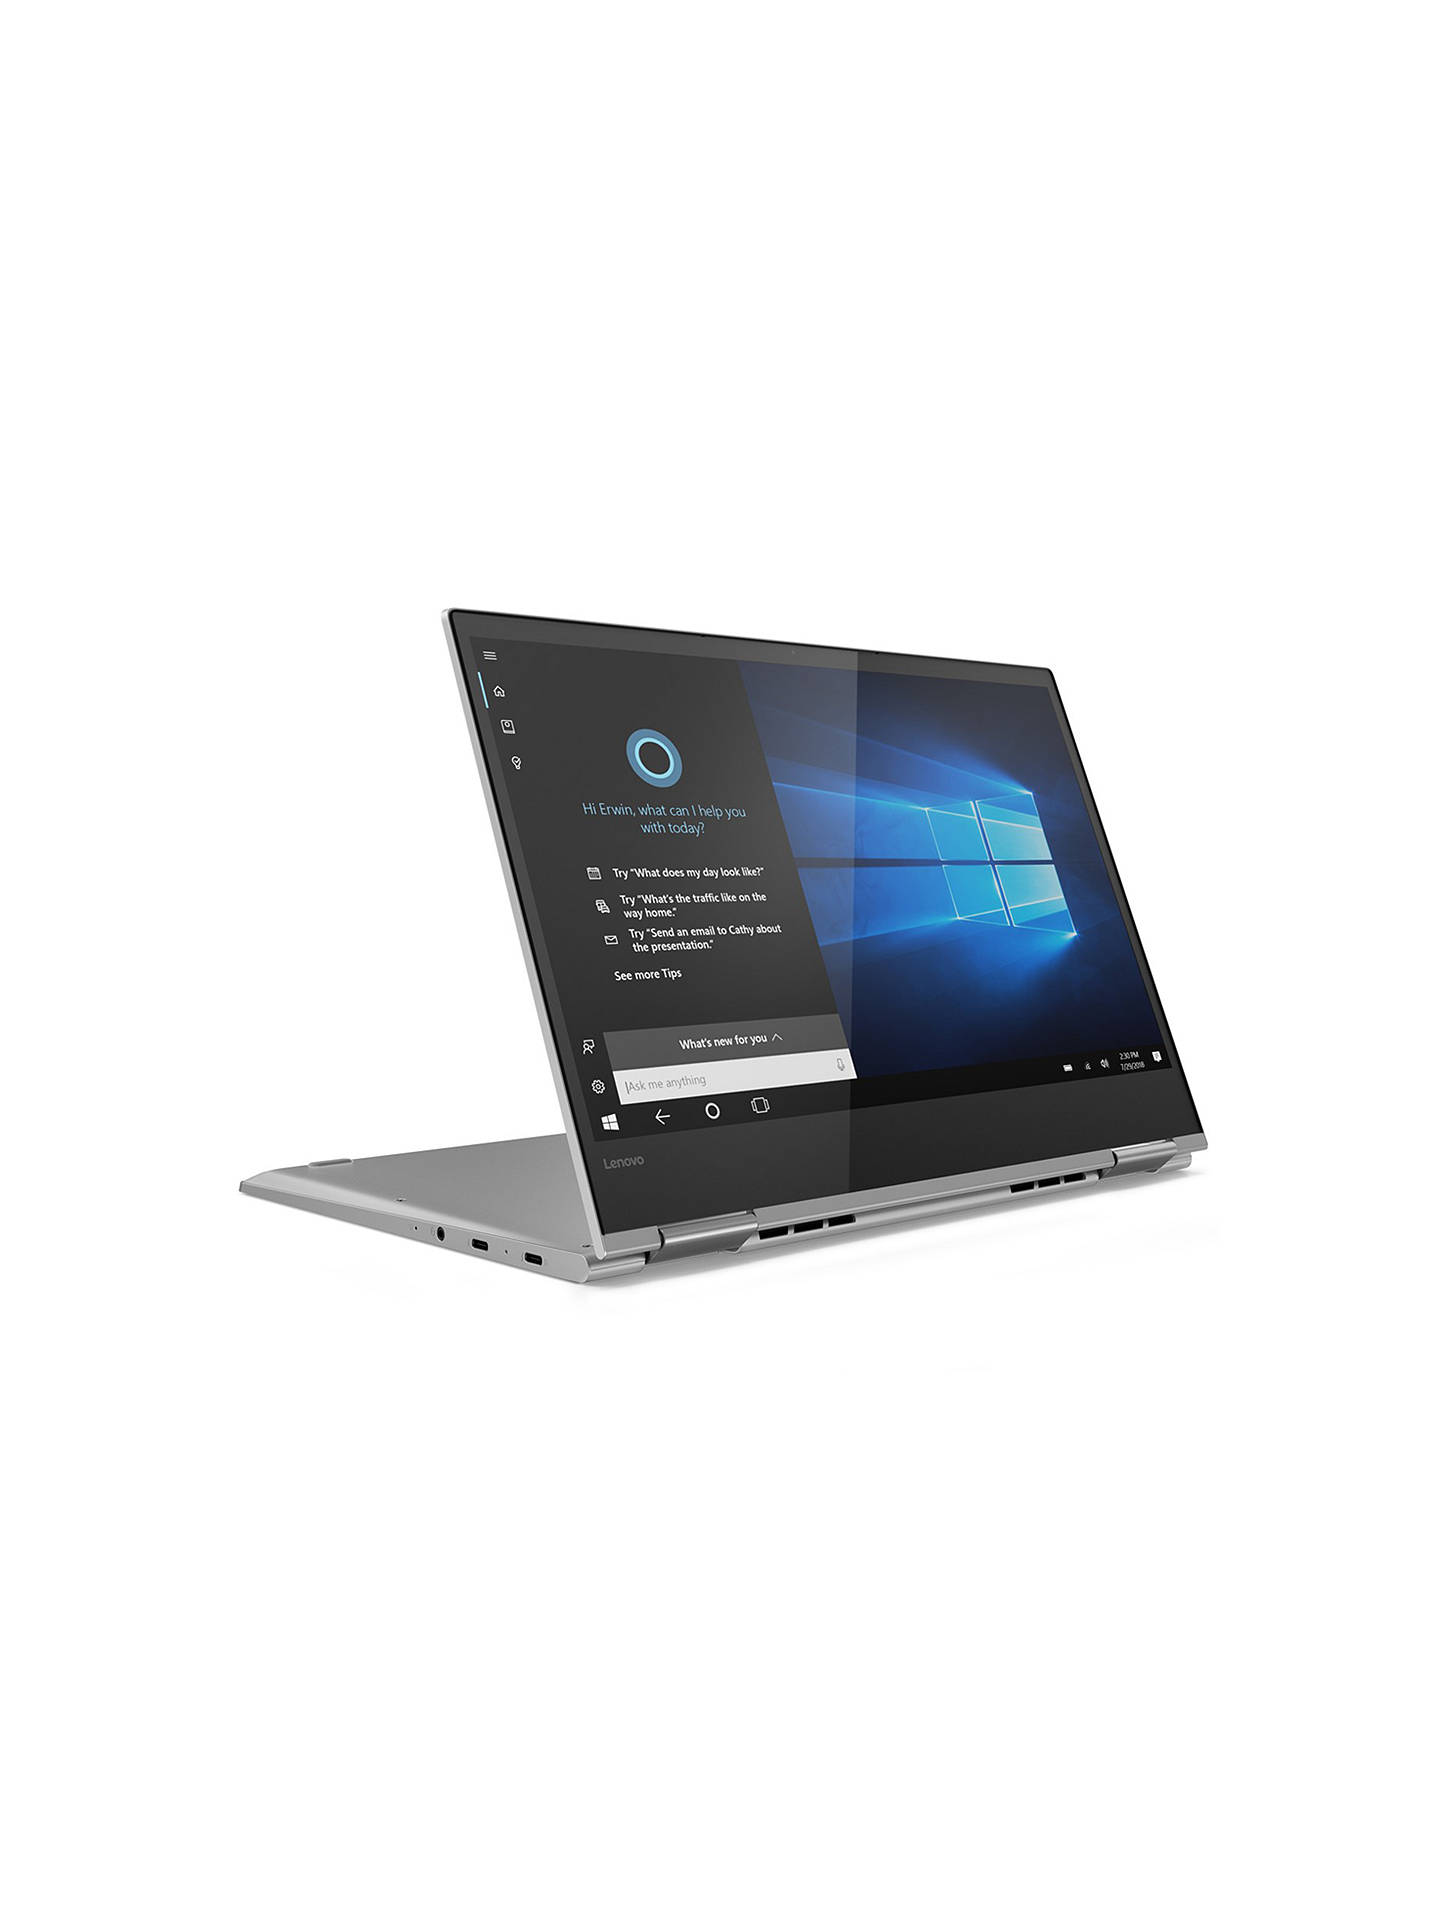 Lenovo Yoga 730 Convertible Laptop, Intel Core i7 Processor, 8GB RAM, 512GB  SSD, 13 3